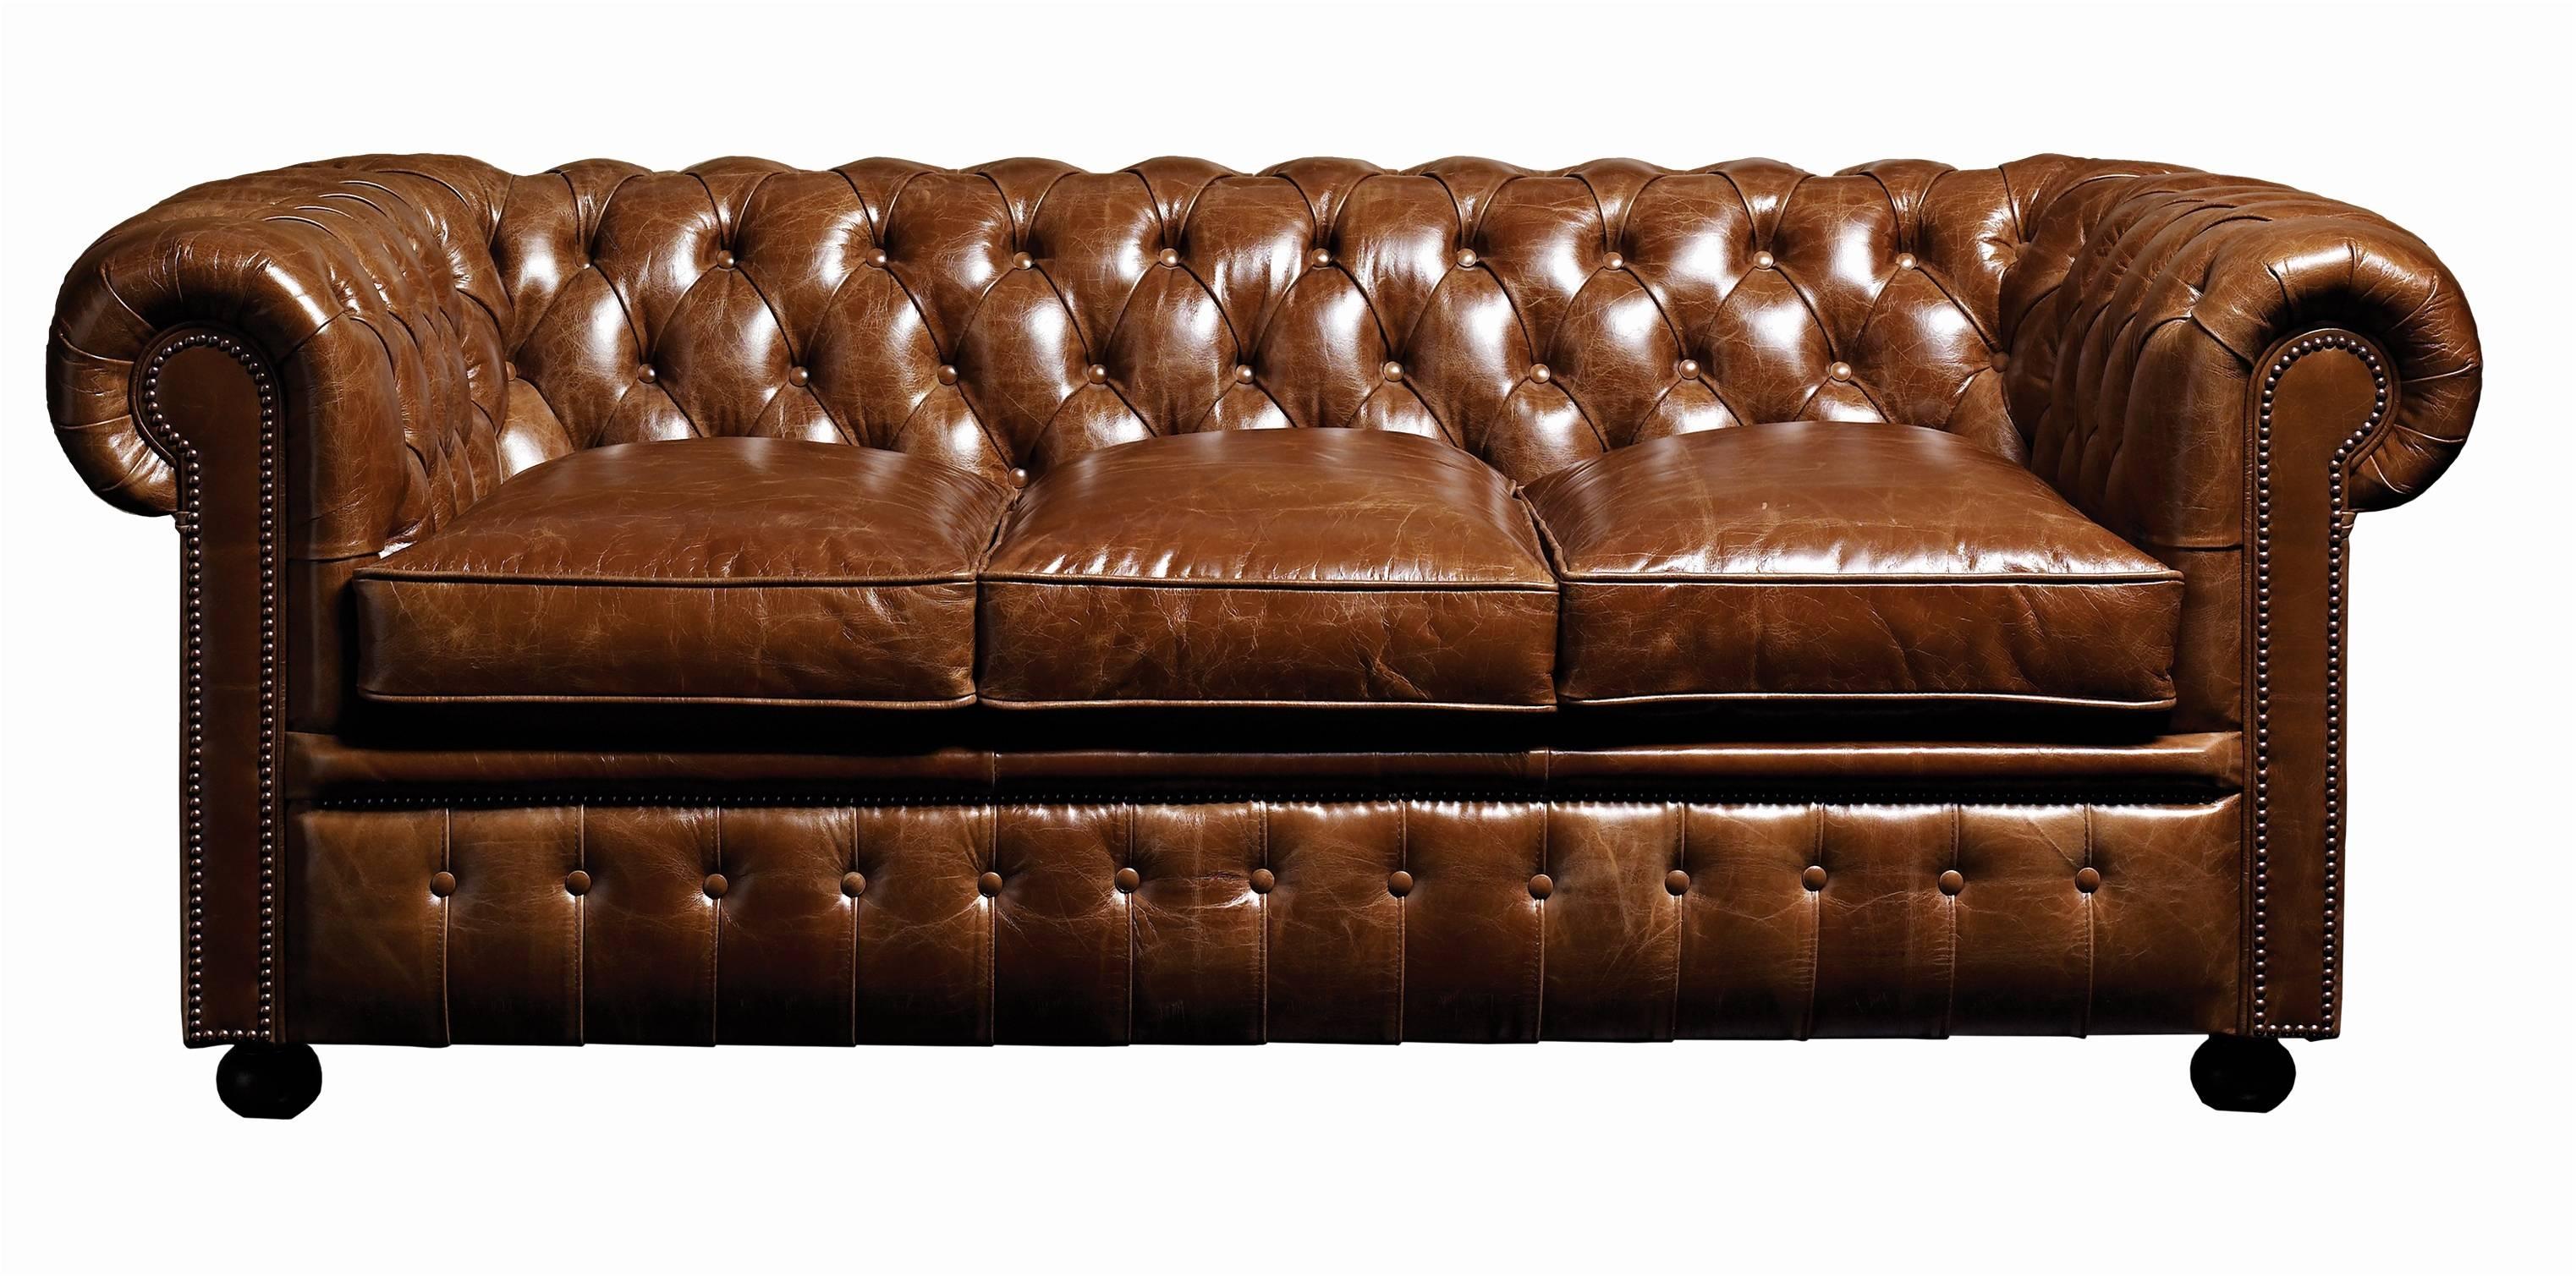 Best Of Chesterfield Sofa Craigslist Luxury – Sofa Furnitures With Craigslist Chesterfield Sofas (View 7 of 15)